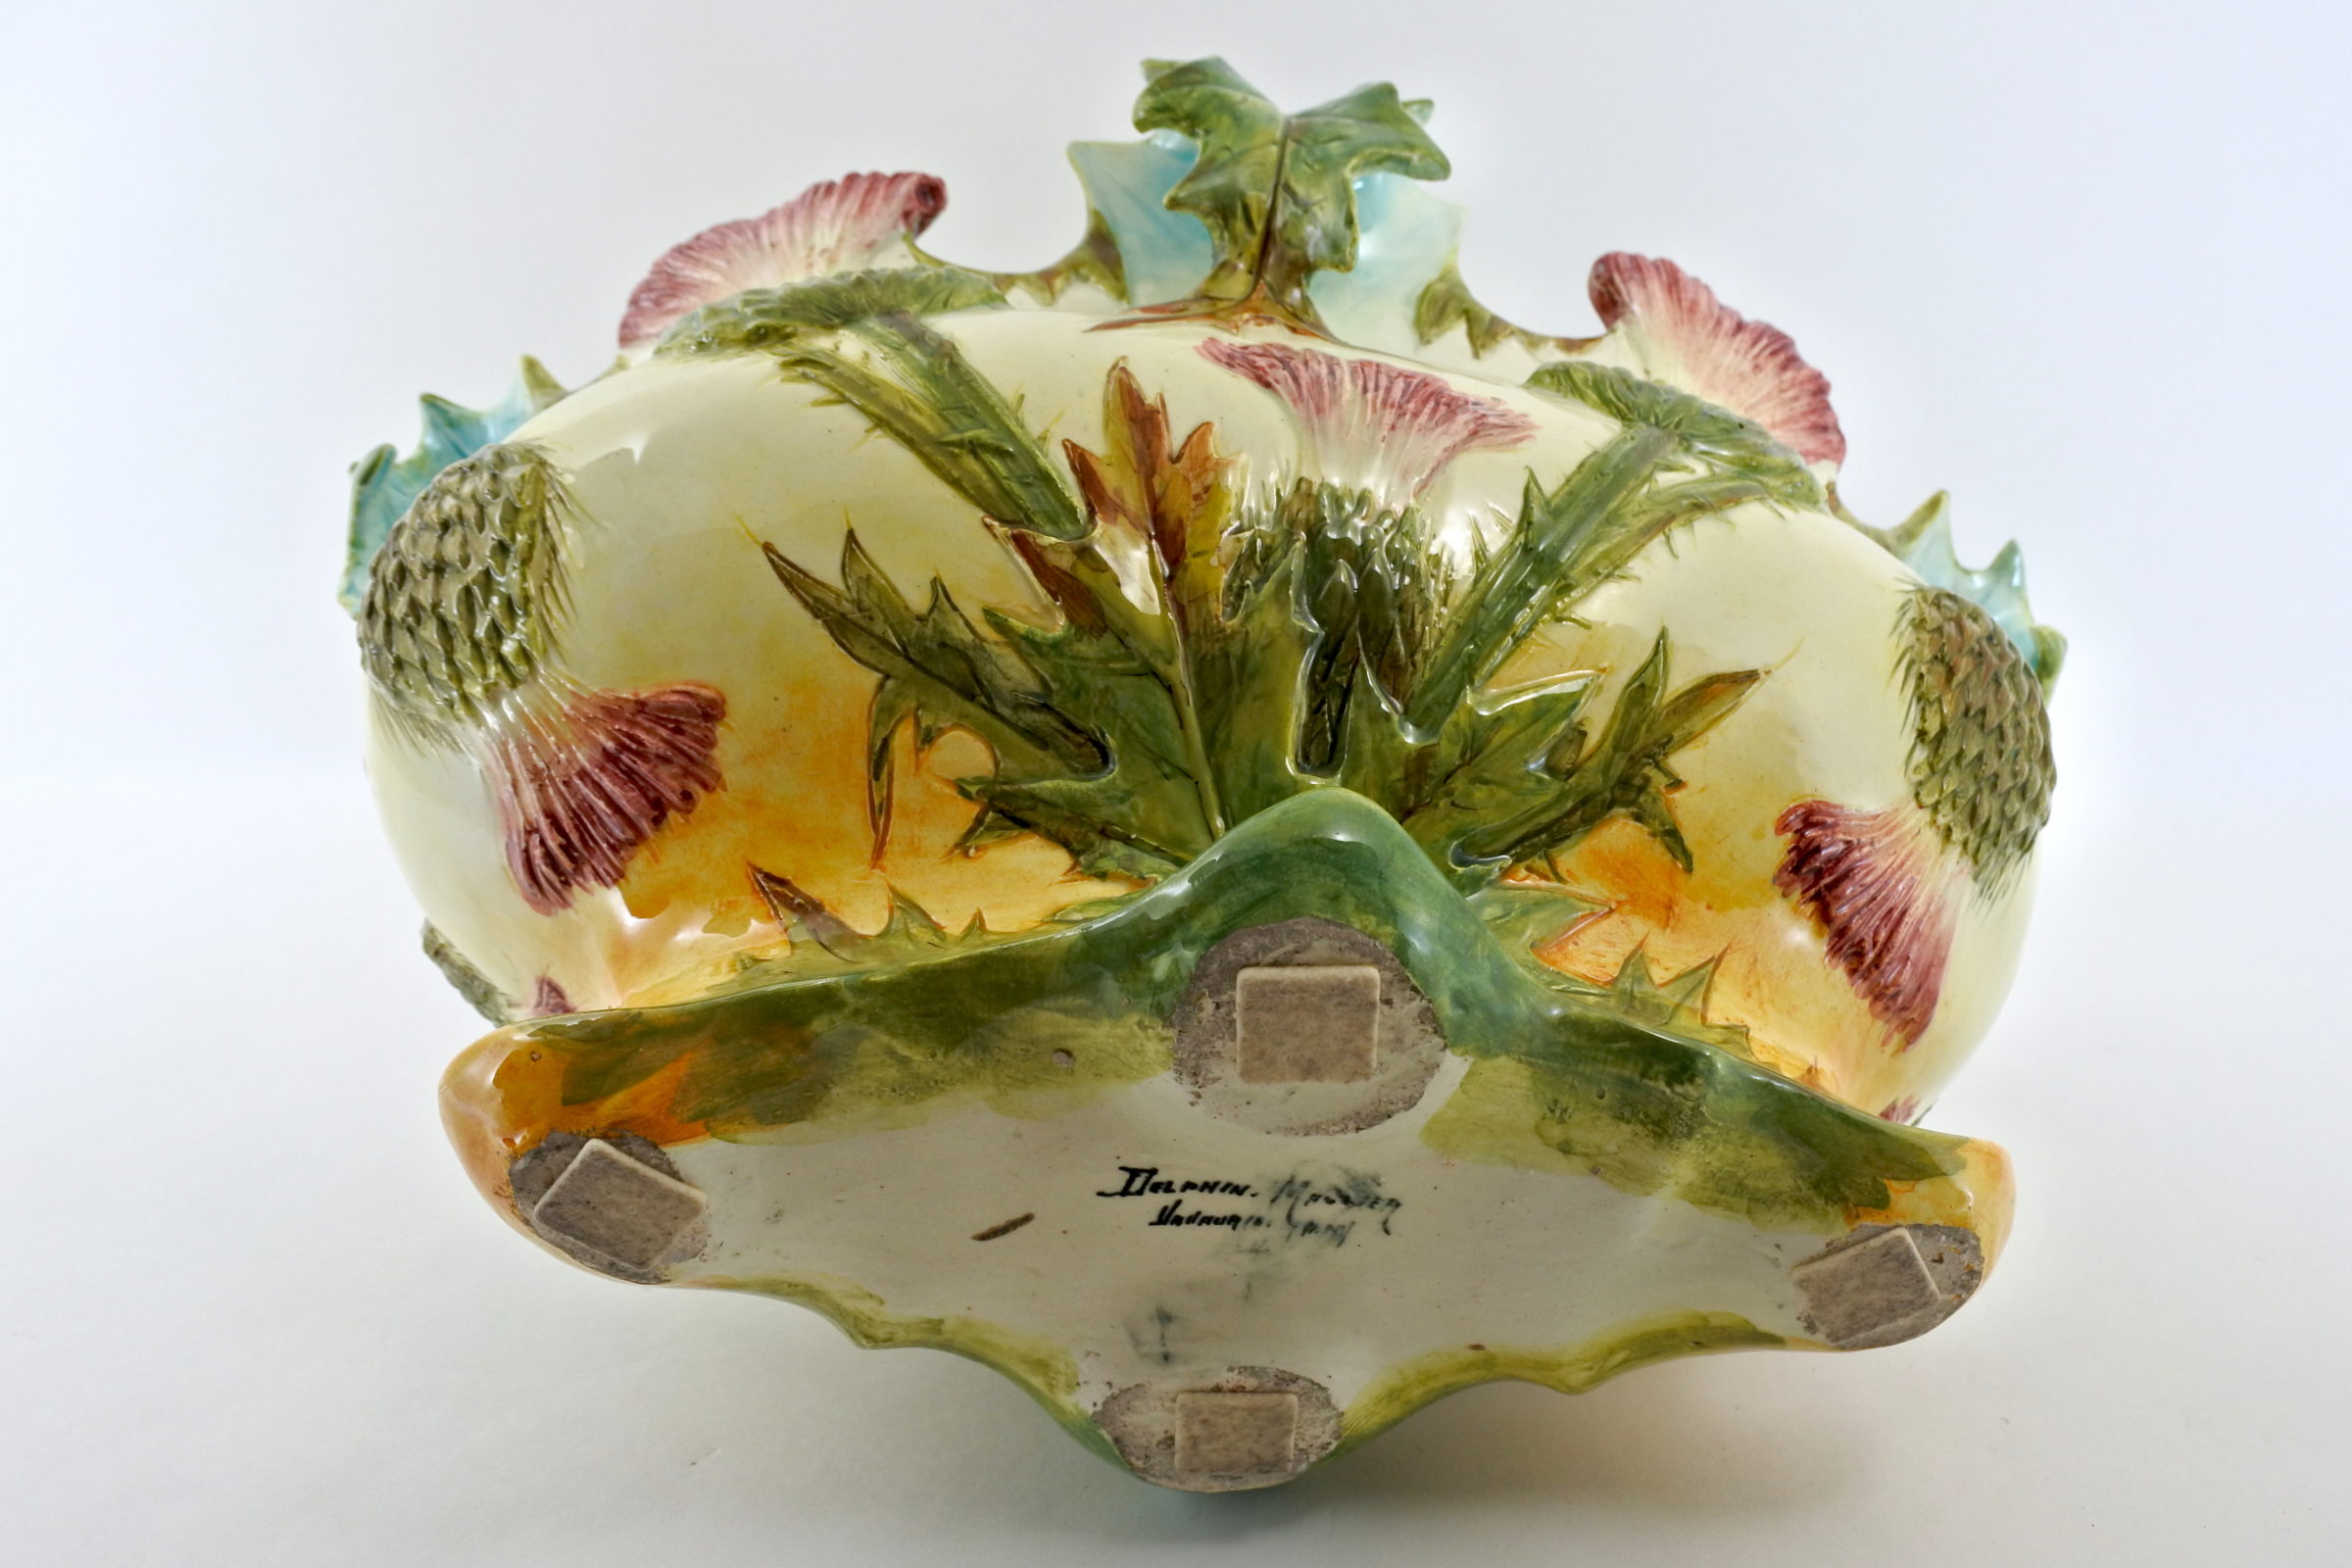 Jardinière Massier in ceramica barbotine con cardi - Chardons - 3